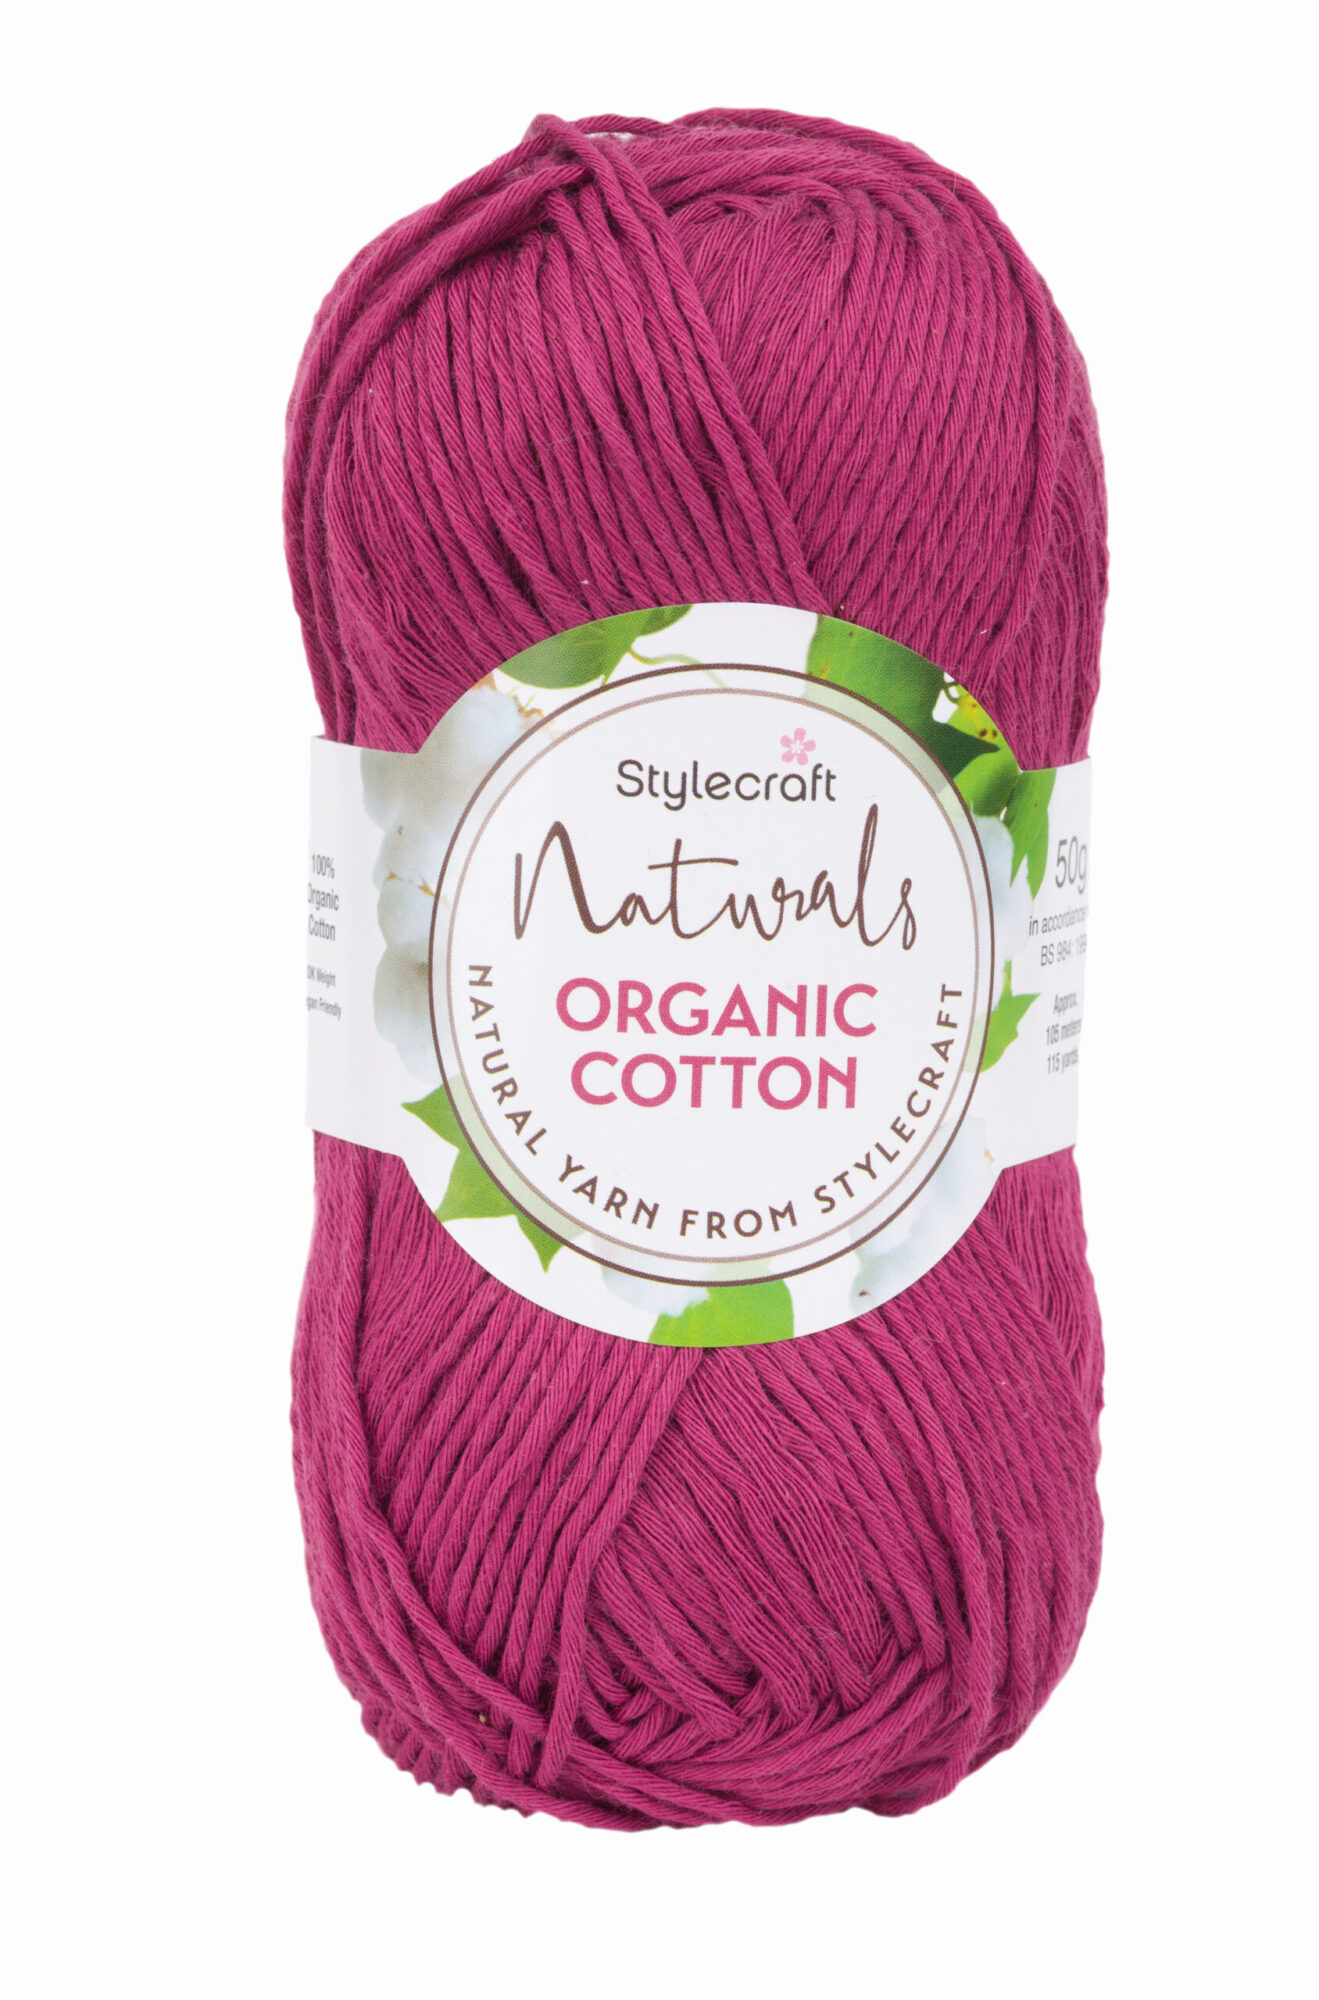 Stylecraft Naturals Organic Cotton product image